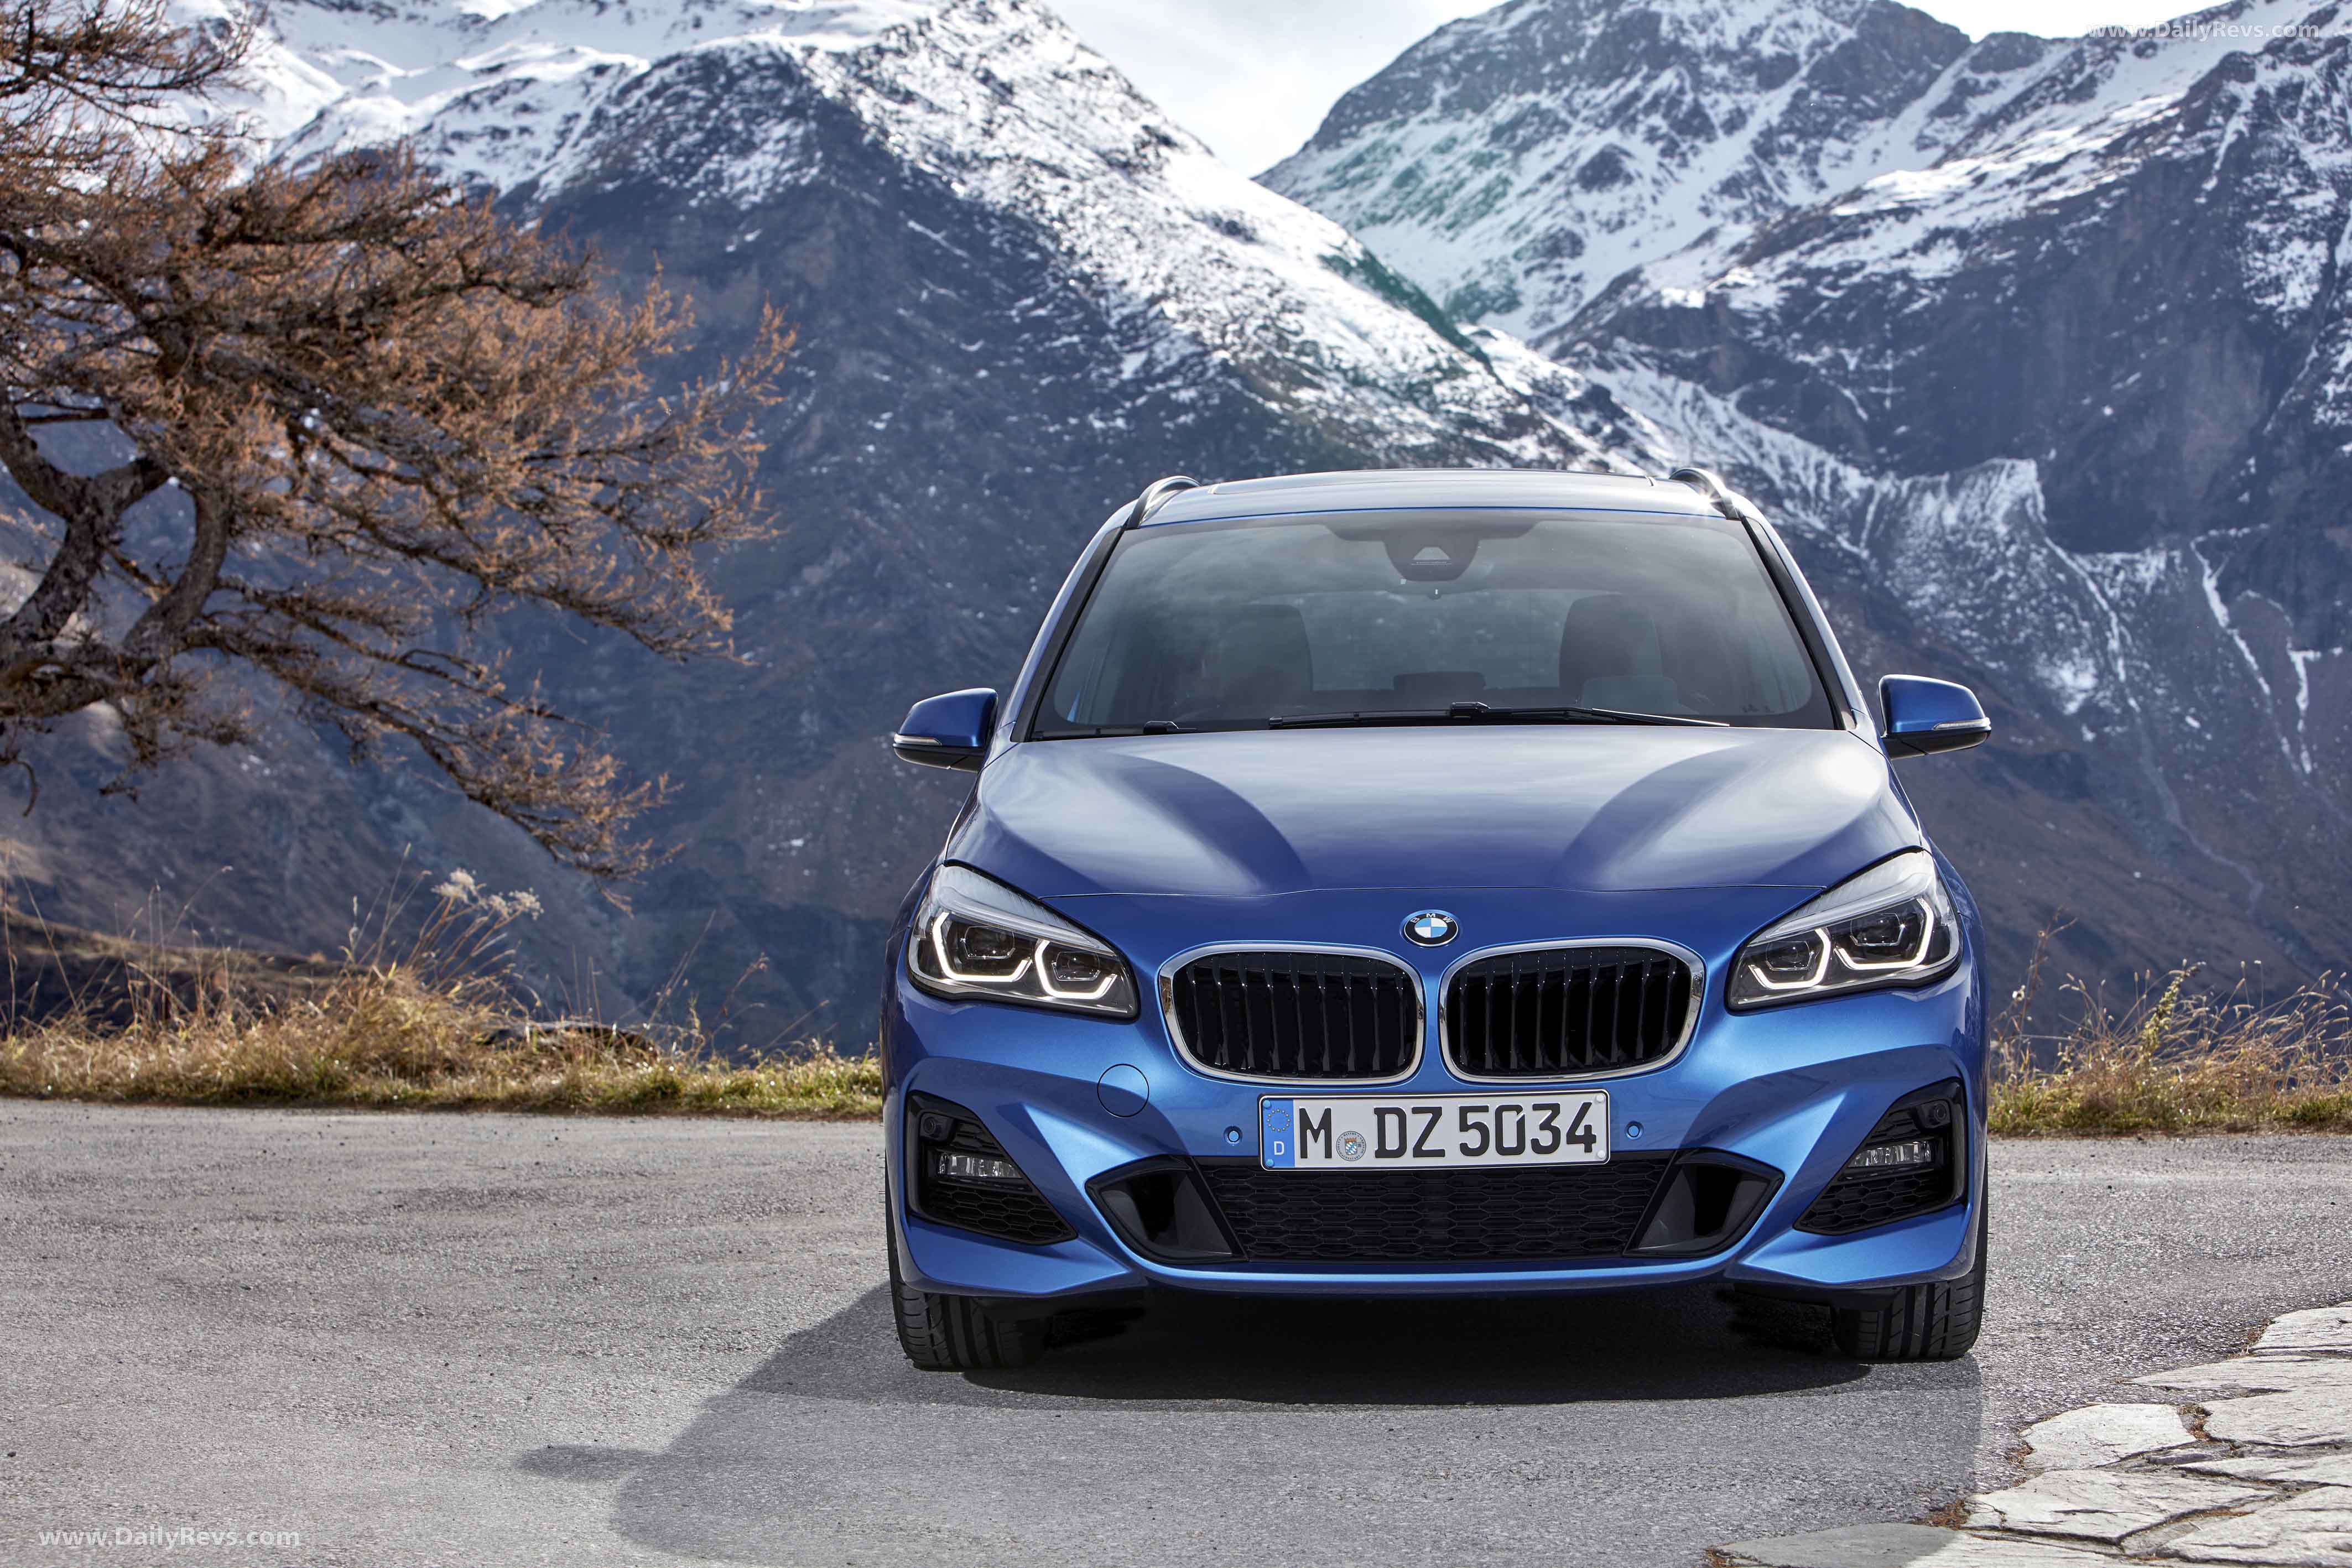 2019 BMW 2-Series Gran Tourer - HD Pictures, Videos, Specs ...